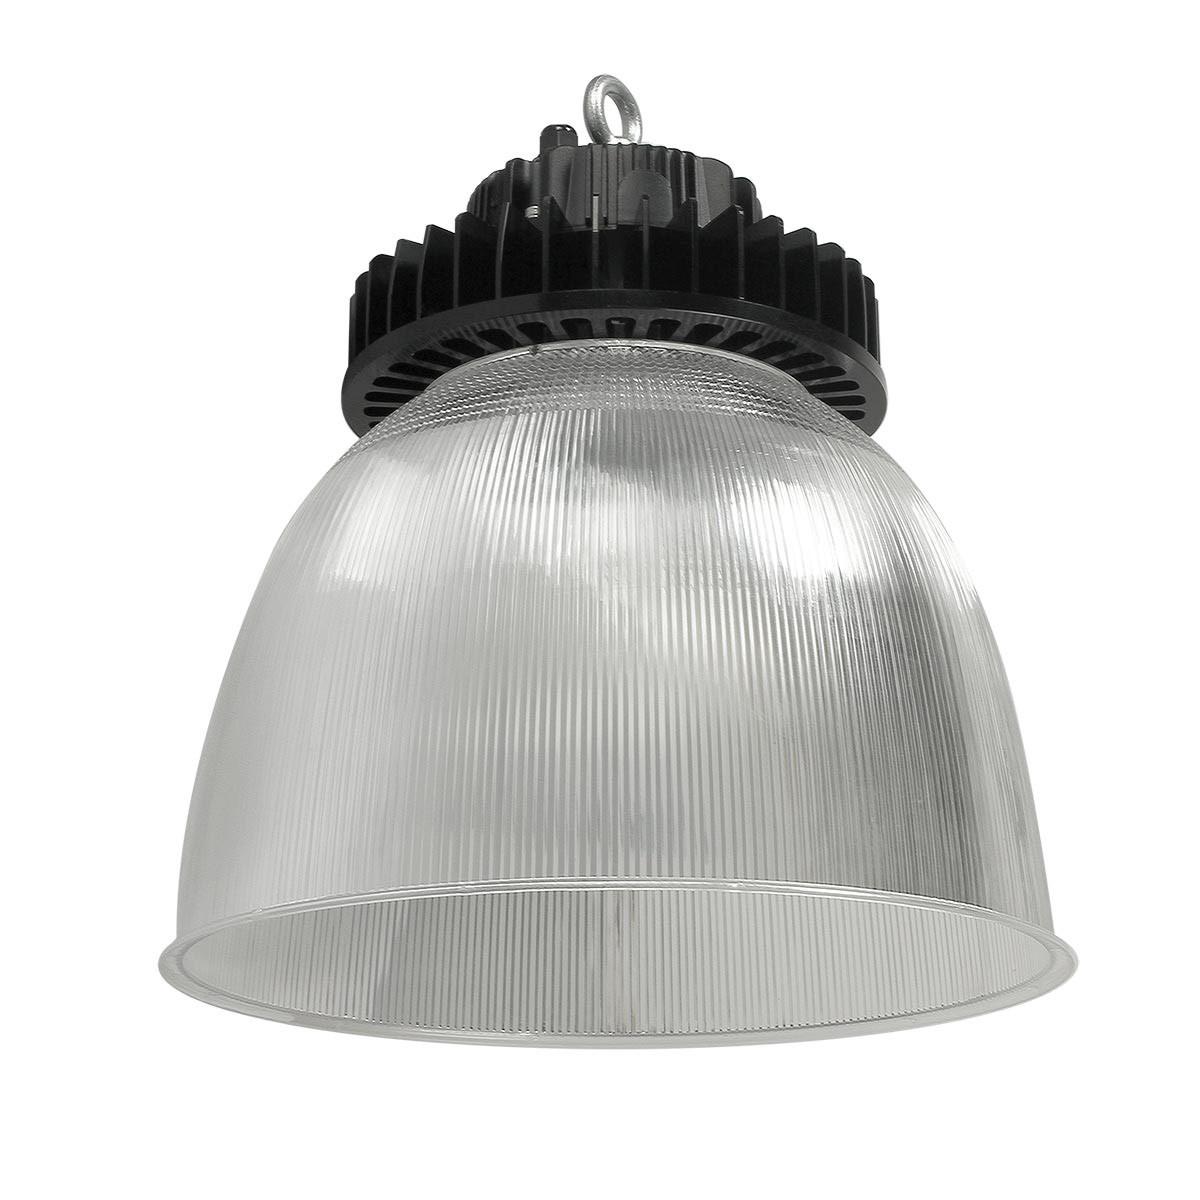 LED UFO Highbay Fixture